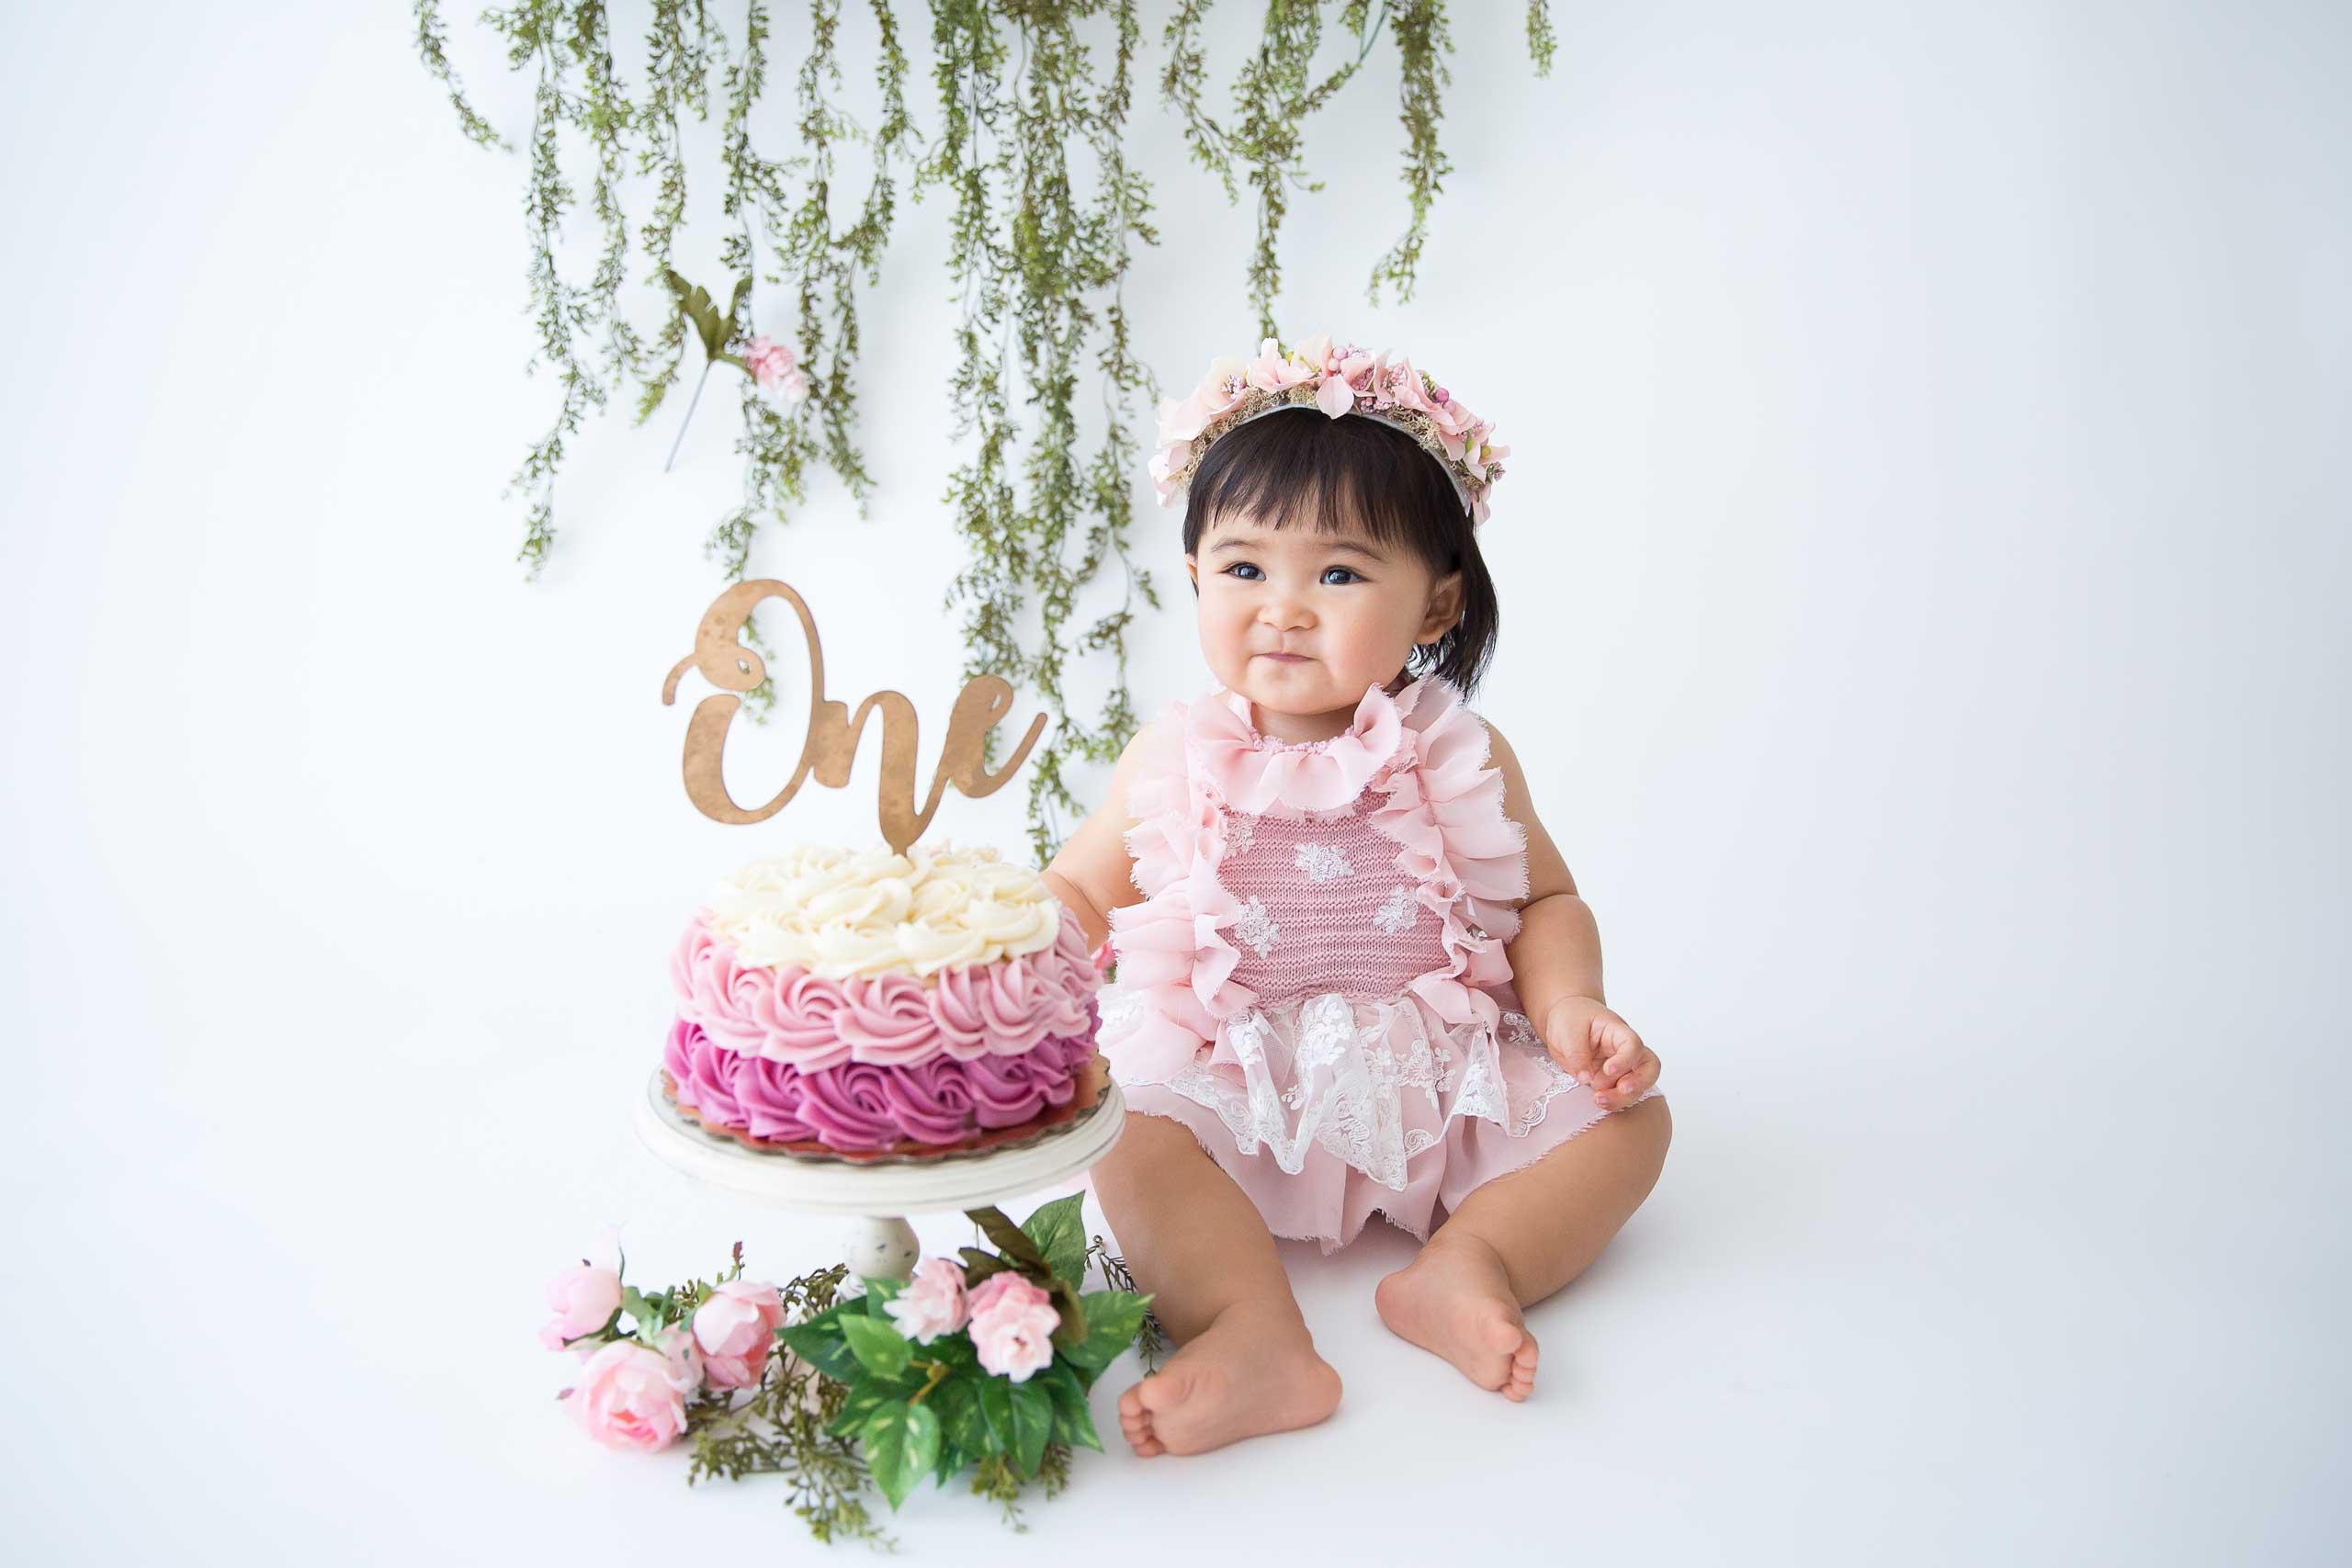 cake smash baby kids photography los angeles ramina magid 5322